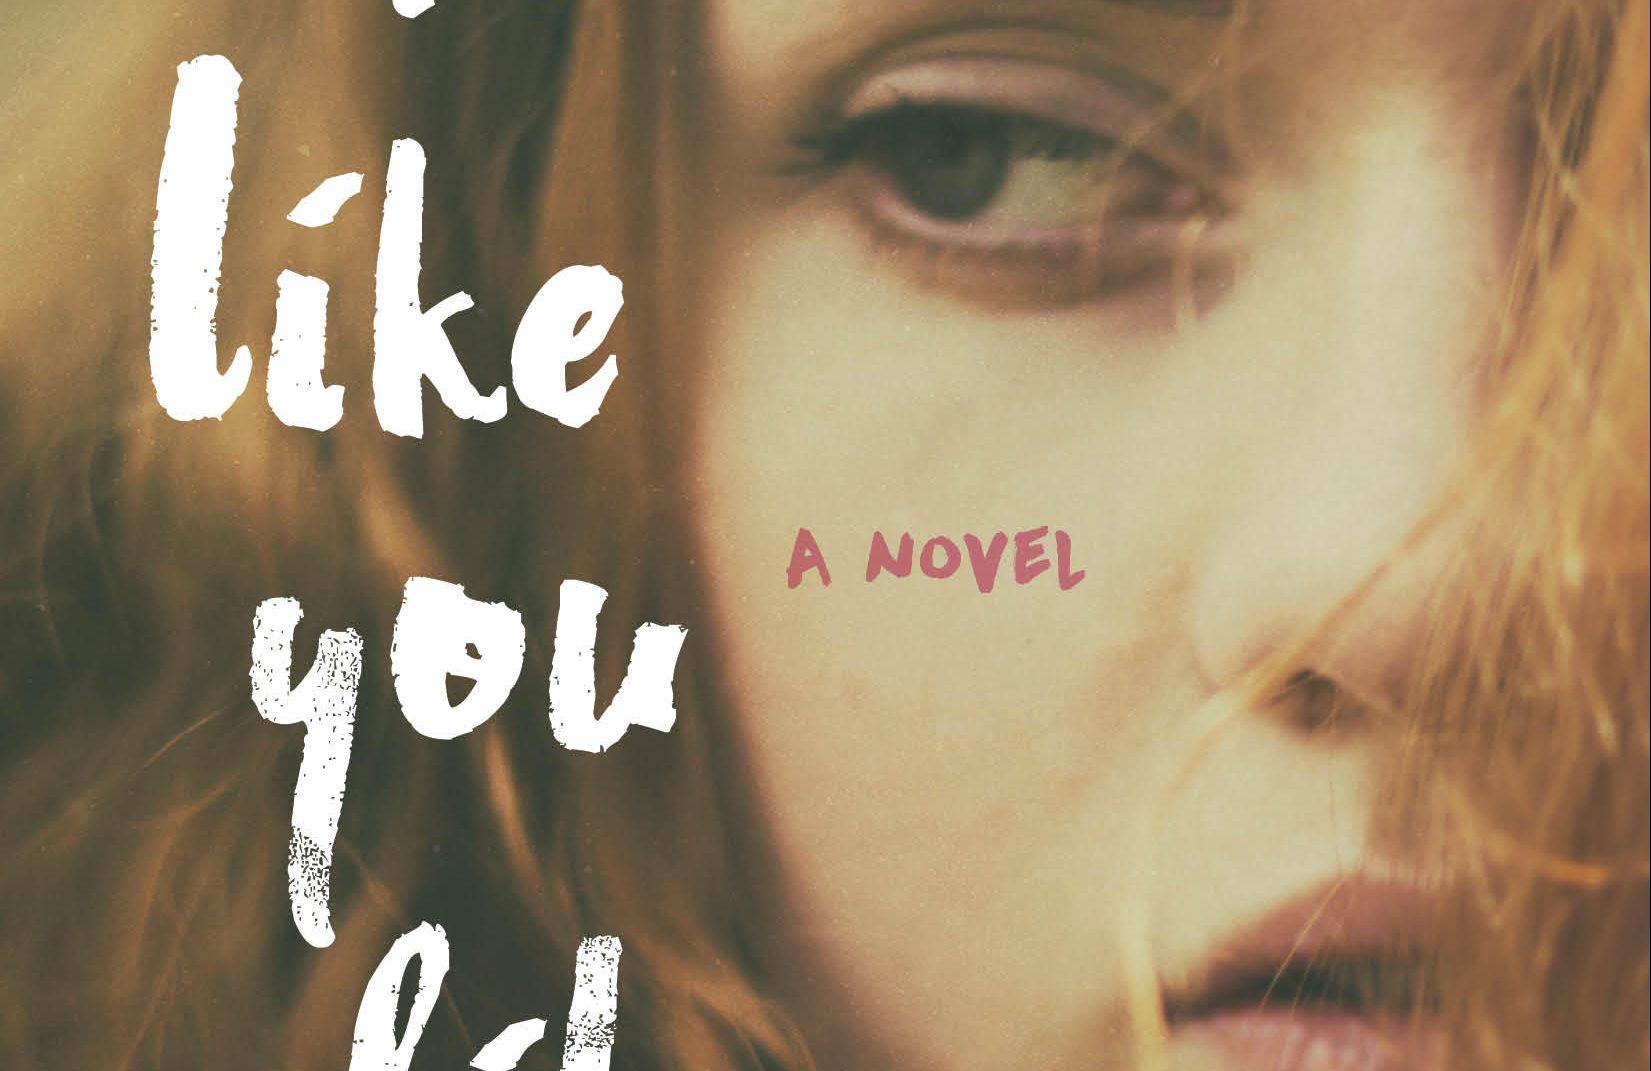 Turning Unlovely to Lovely: Essay by YA Author Heather Cumiskey